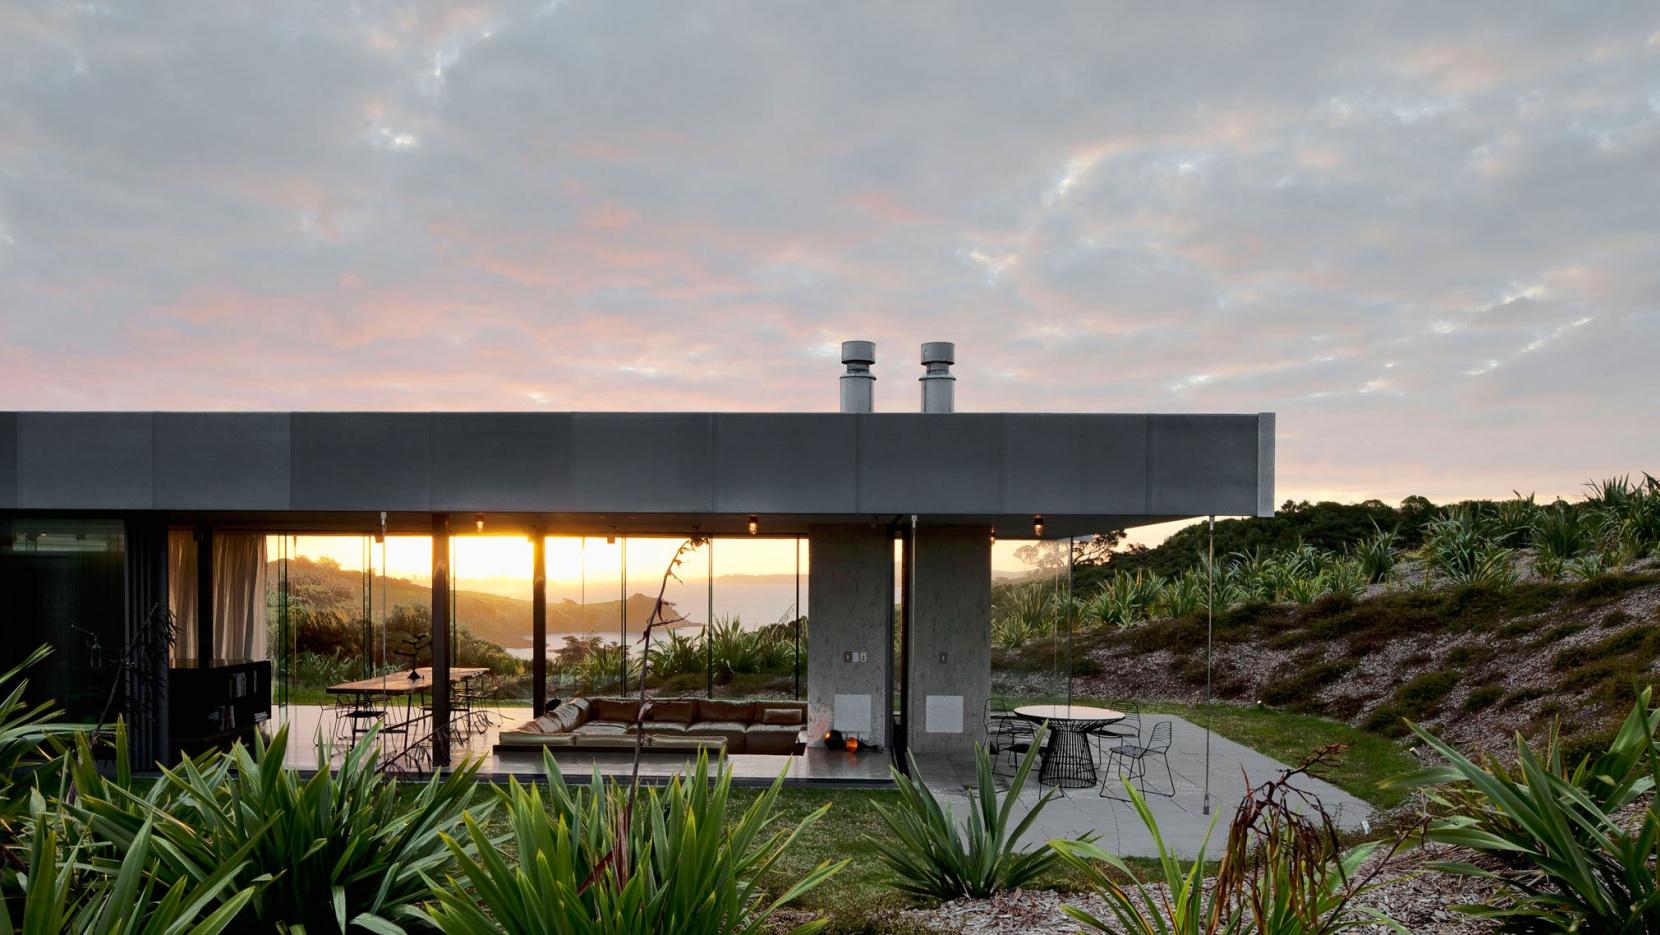 Island Retreat By Fearon Hay Architects In Waiheke Island, New Zealand